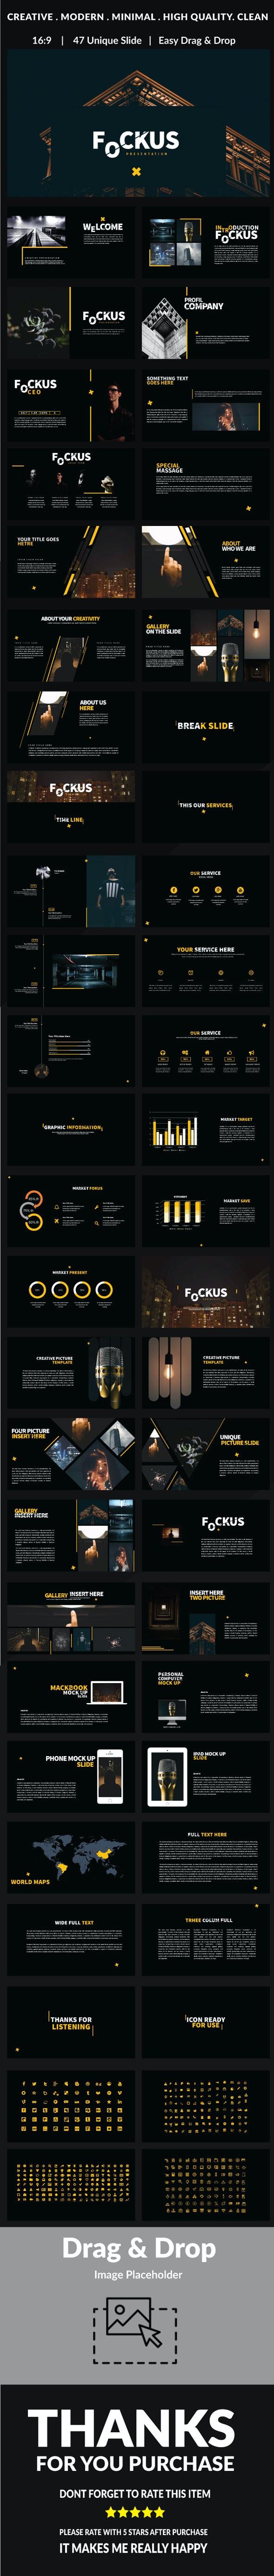 Fockus - Google Slide - Google Slides Presentation Templates